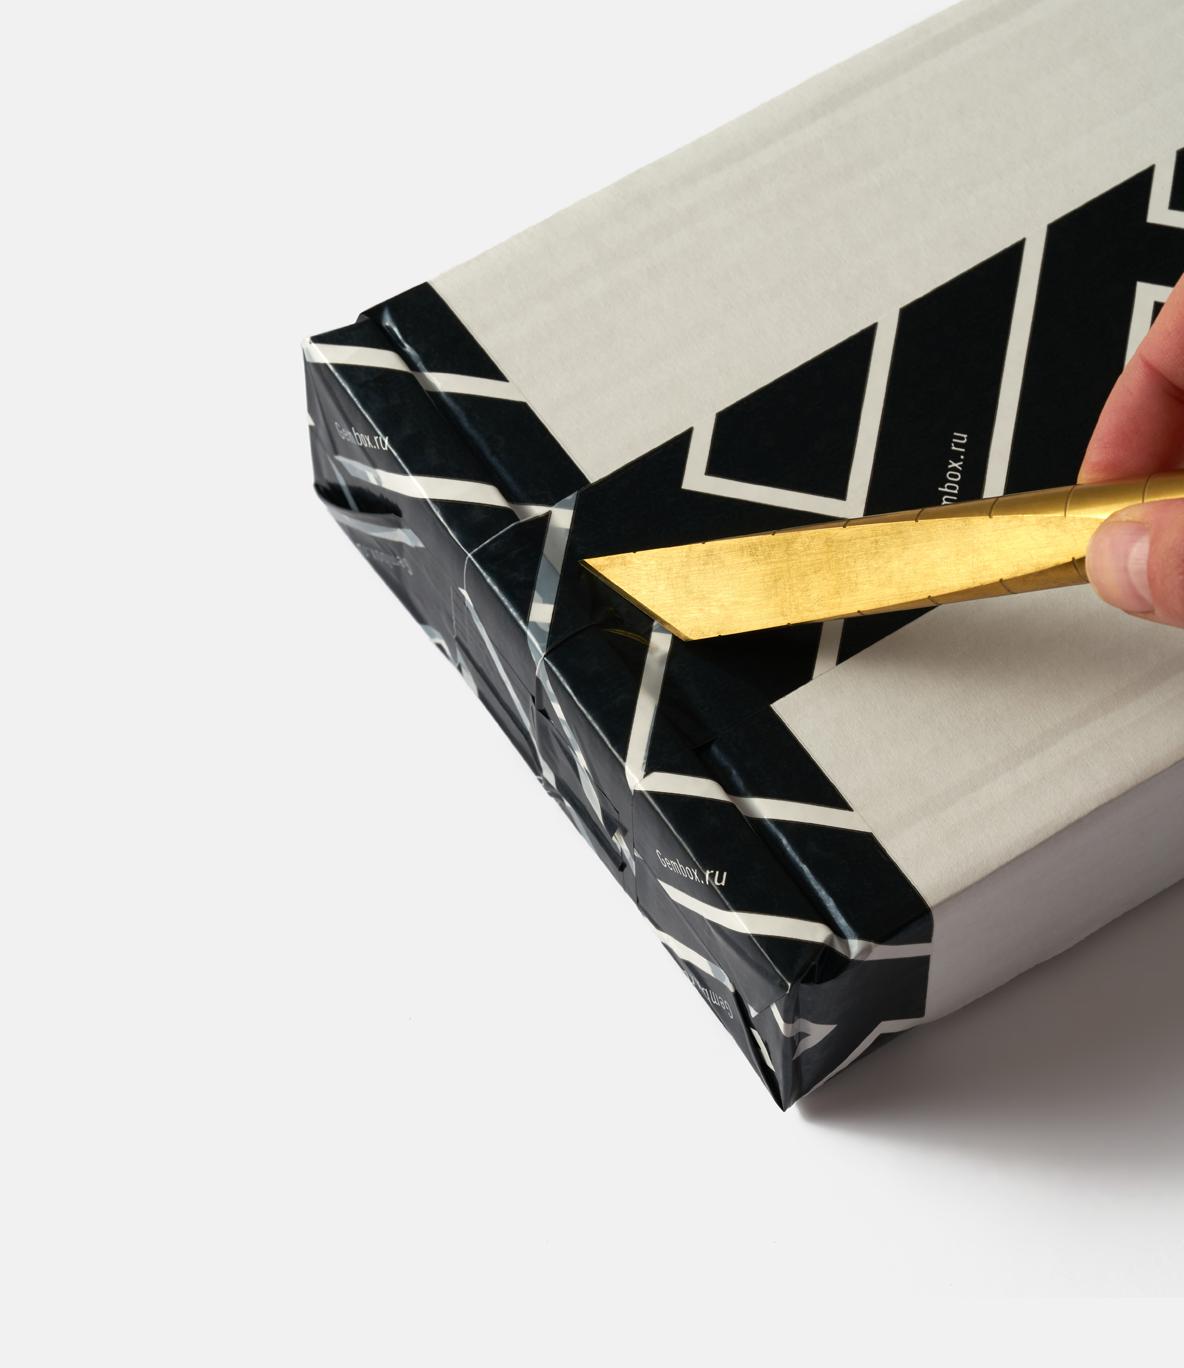 Craighill Desk Knife Brass — настольный нож из латуни